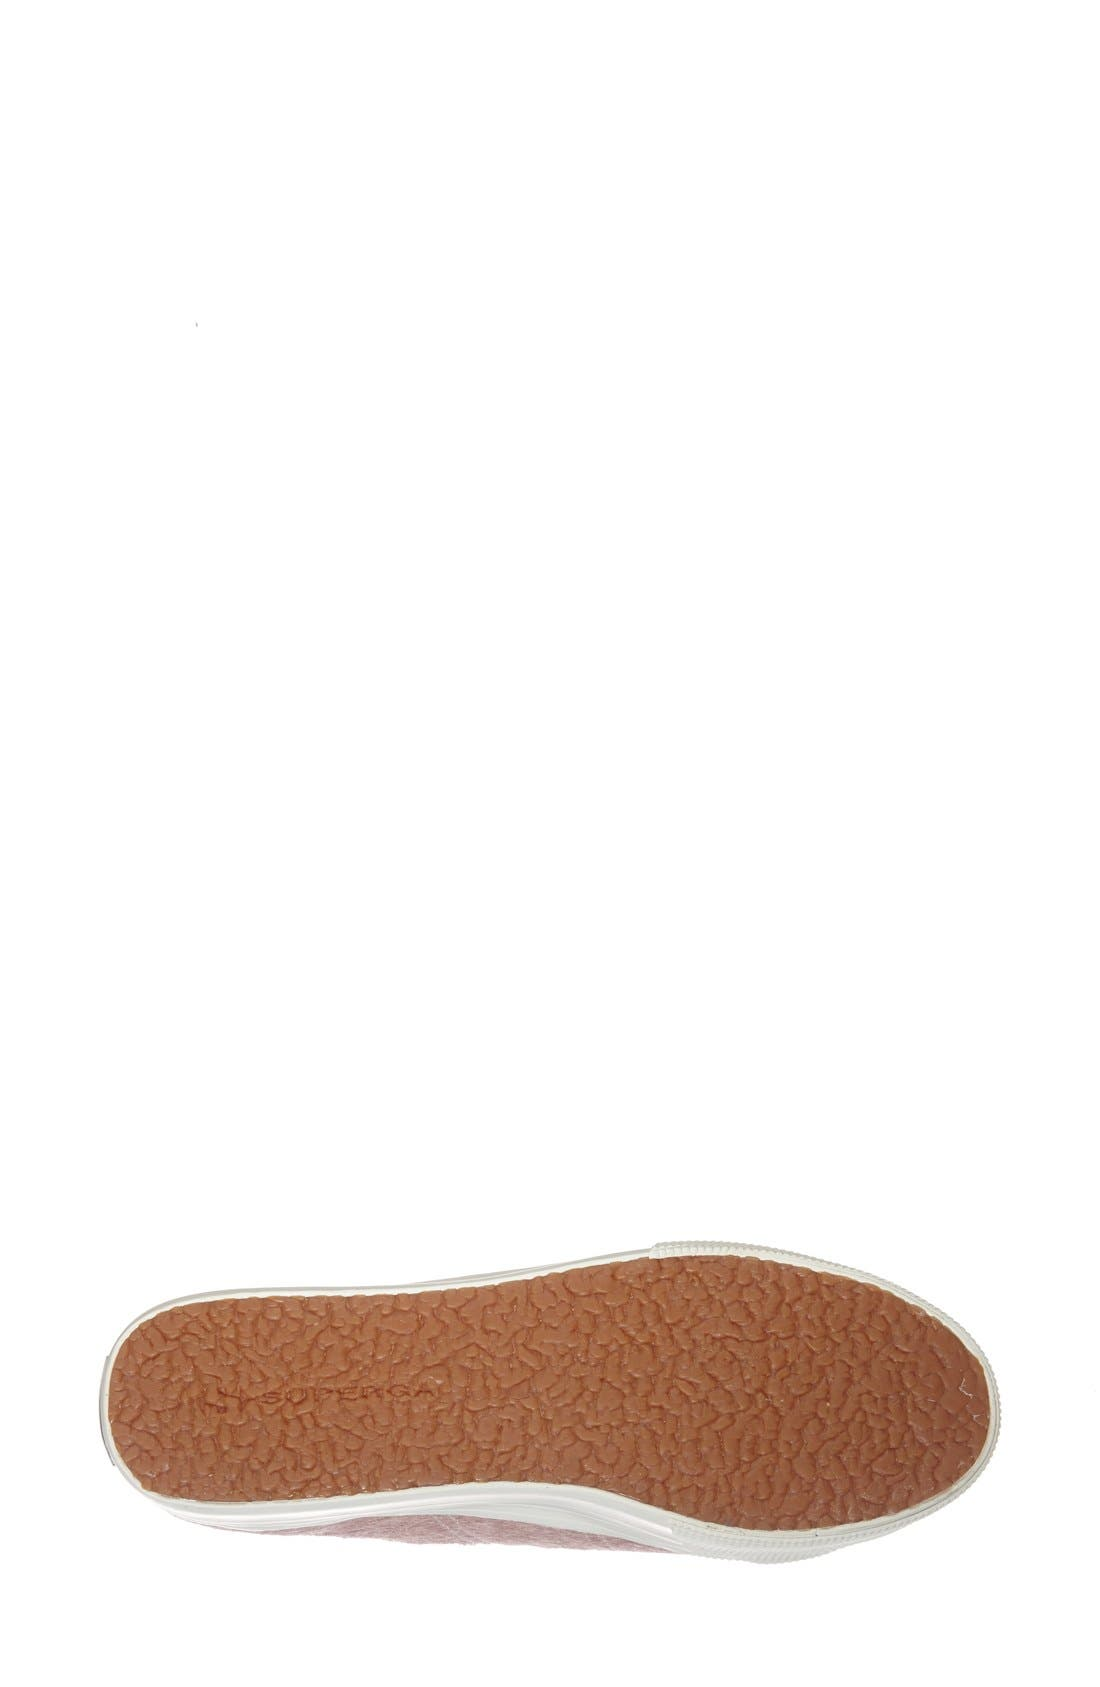 Alternate Image 4  - Superga Calf Hair Lace Up Sneaker (Women)